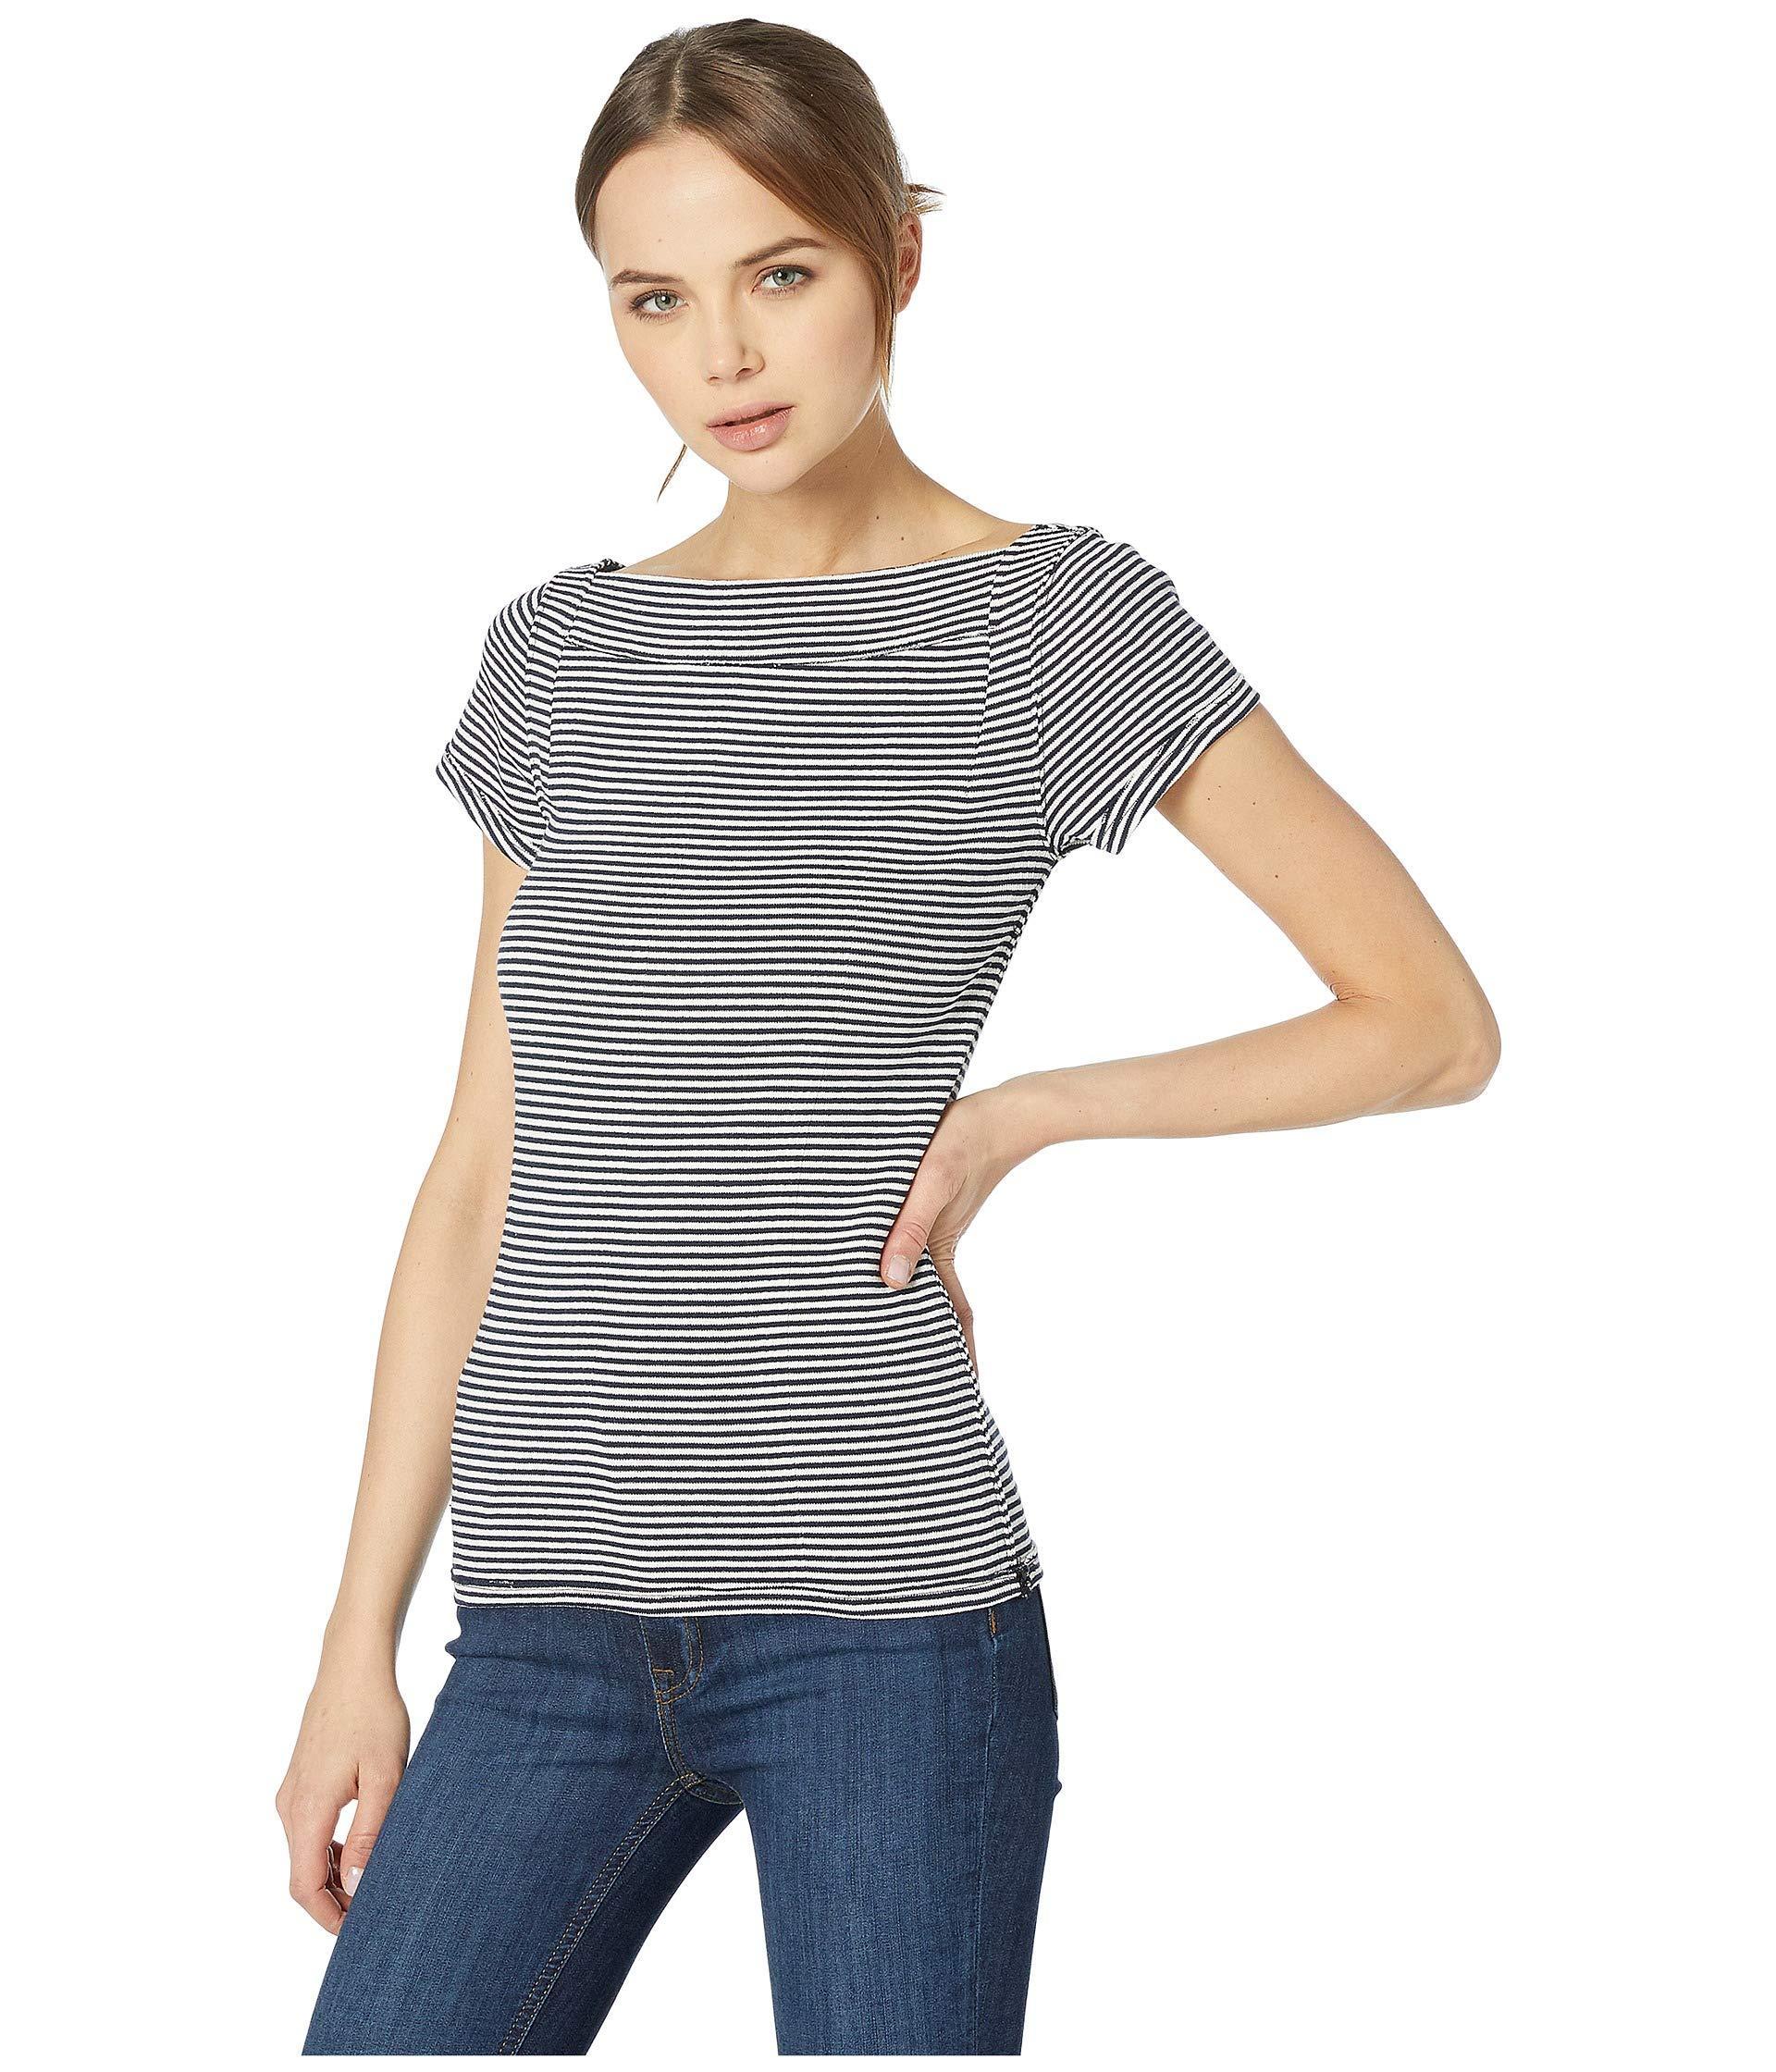 597b627c98a03 Lyst - Free People Ahoy Tee Stripe (navy) Women s T Shirt in Blue